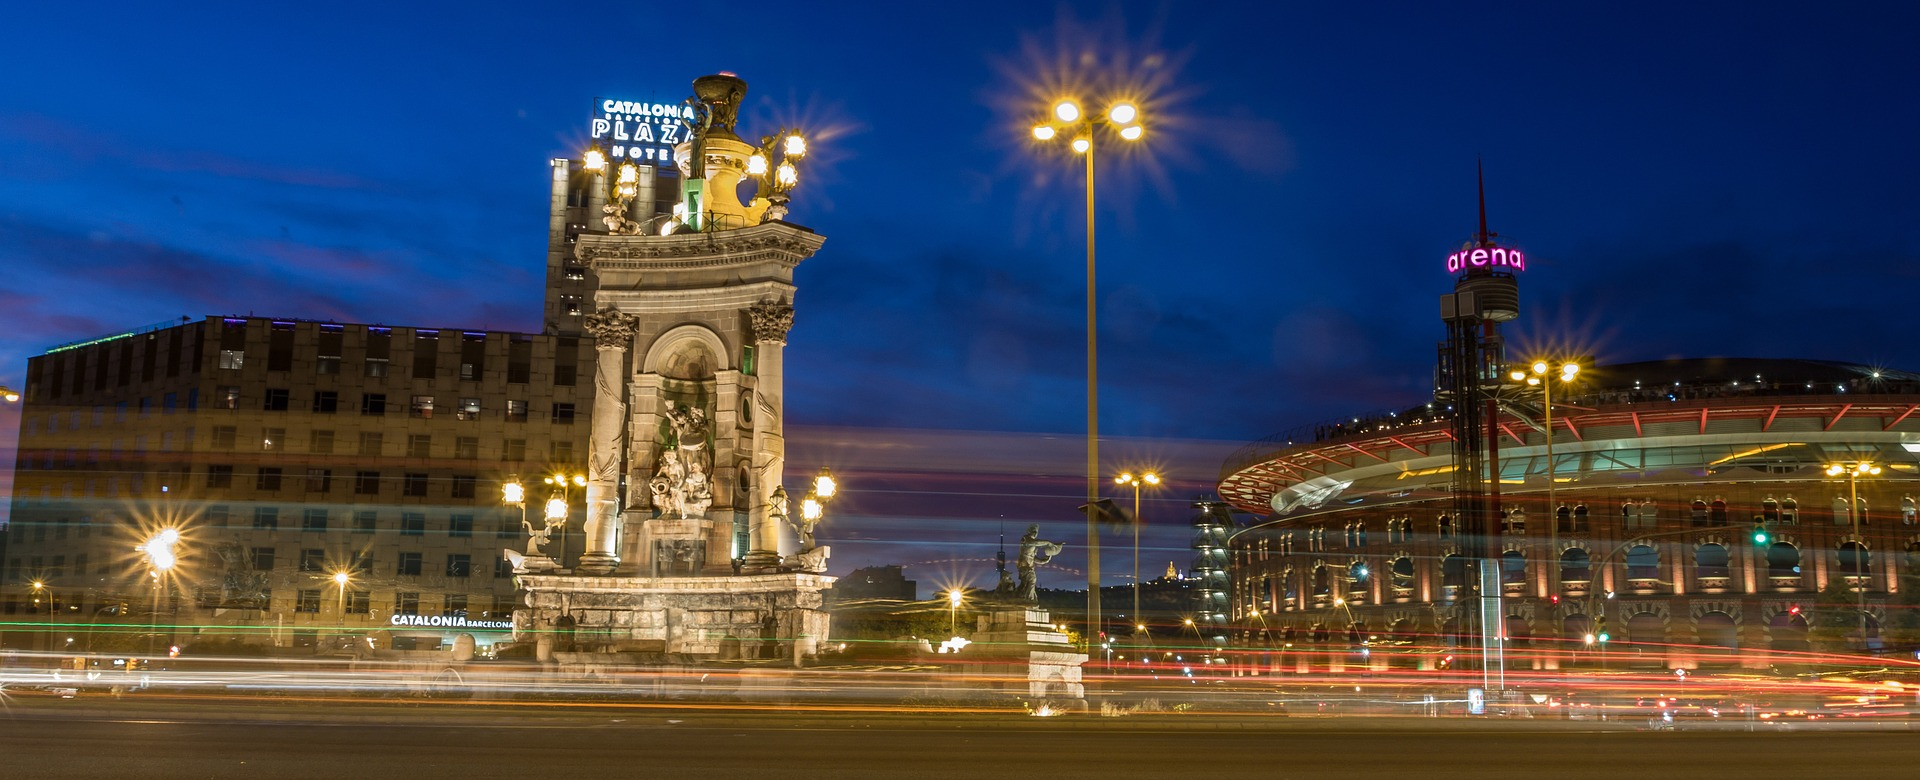 Städtefotografie Barcelona: Plaça d'Espanya